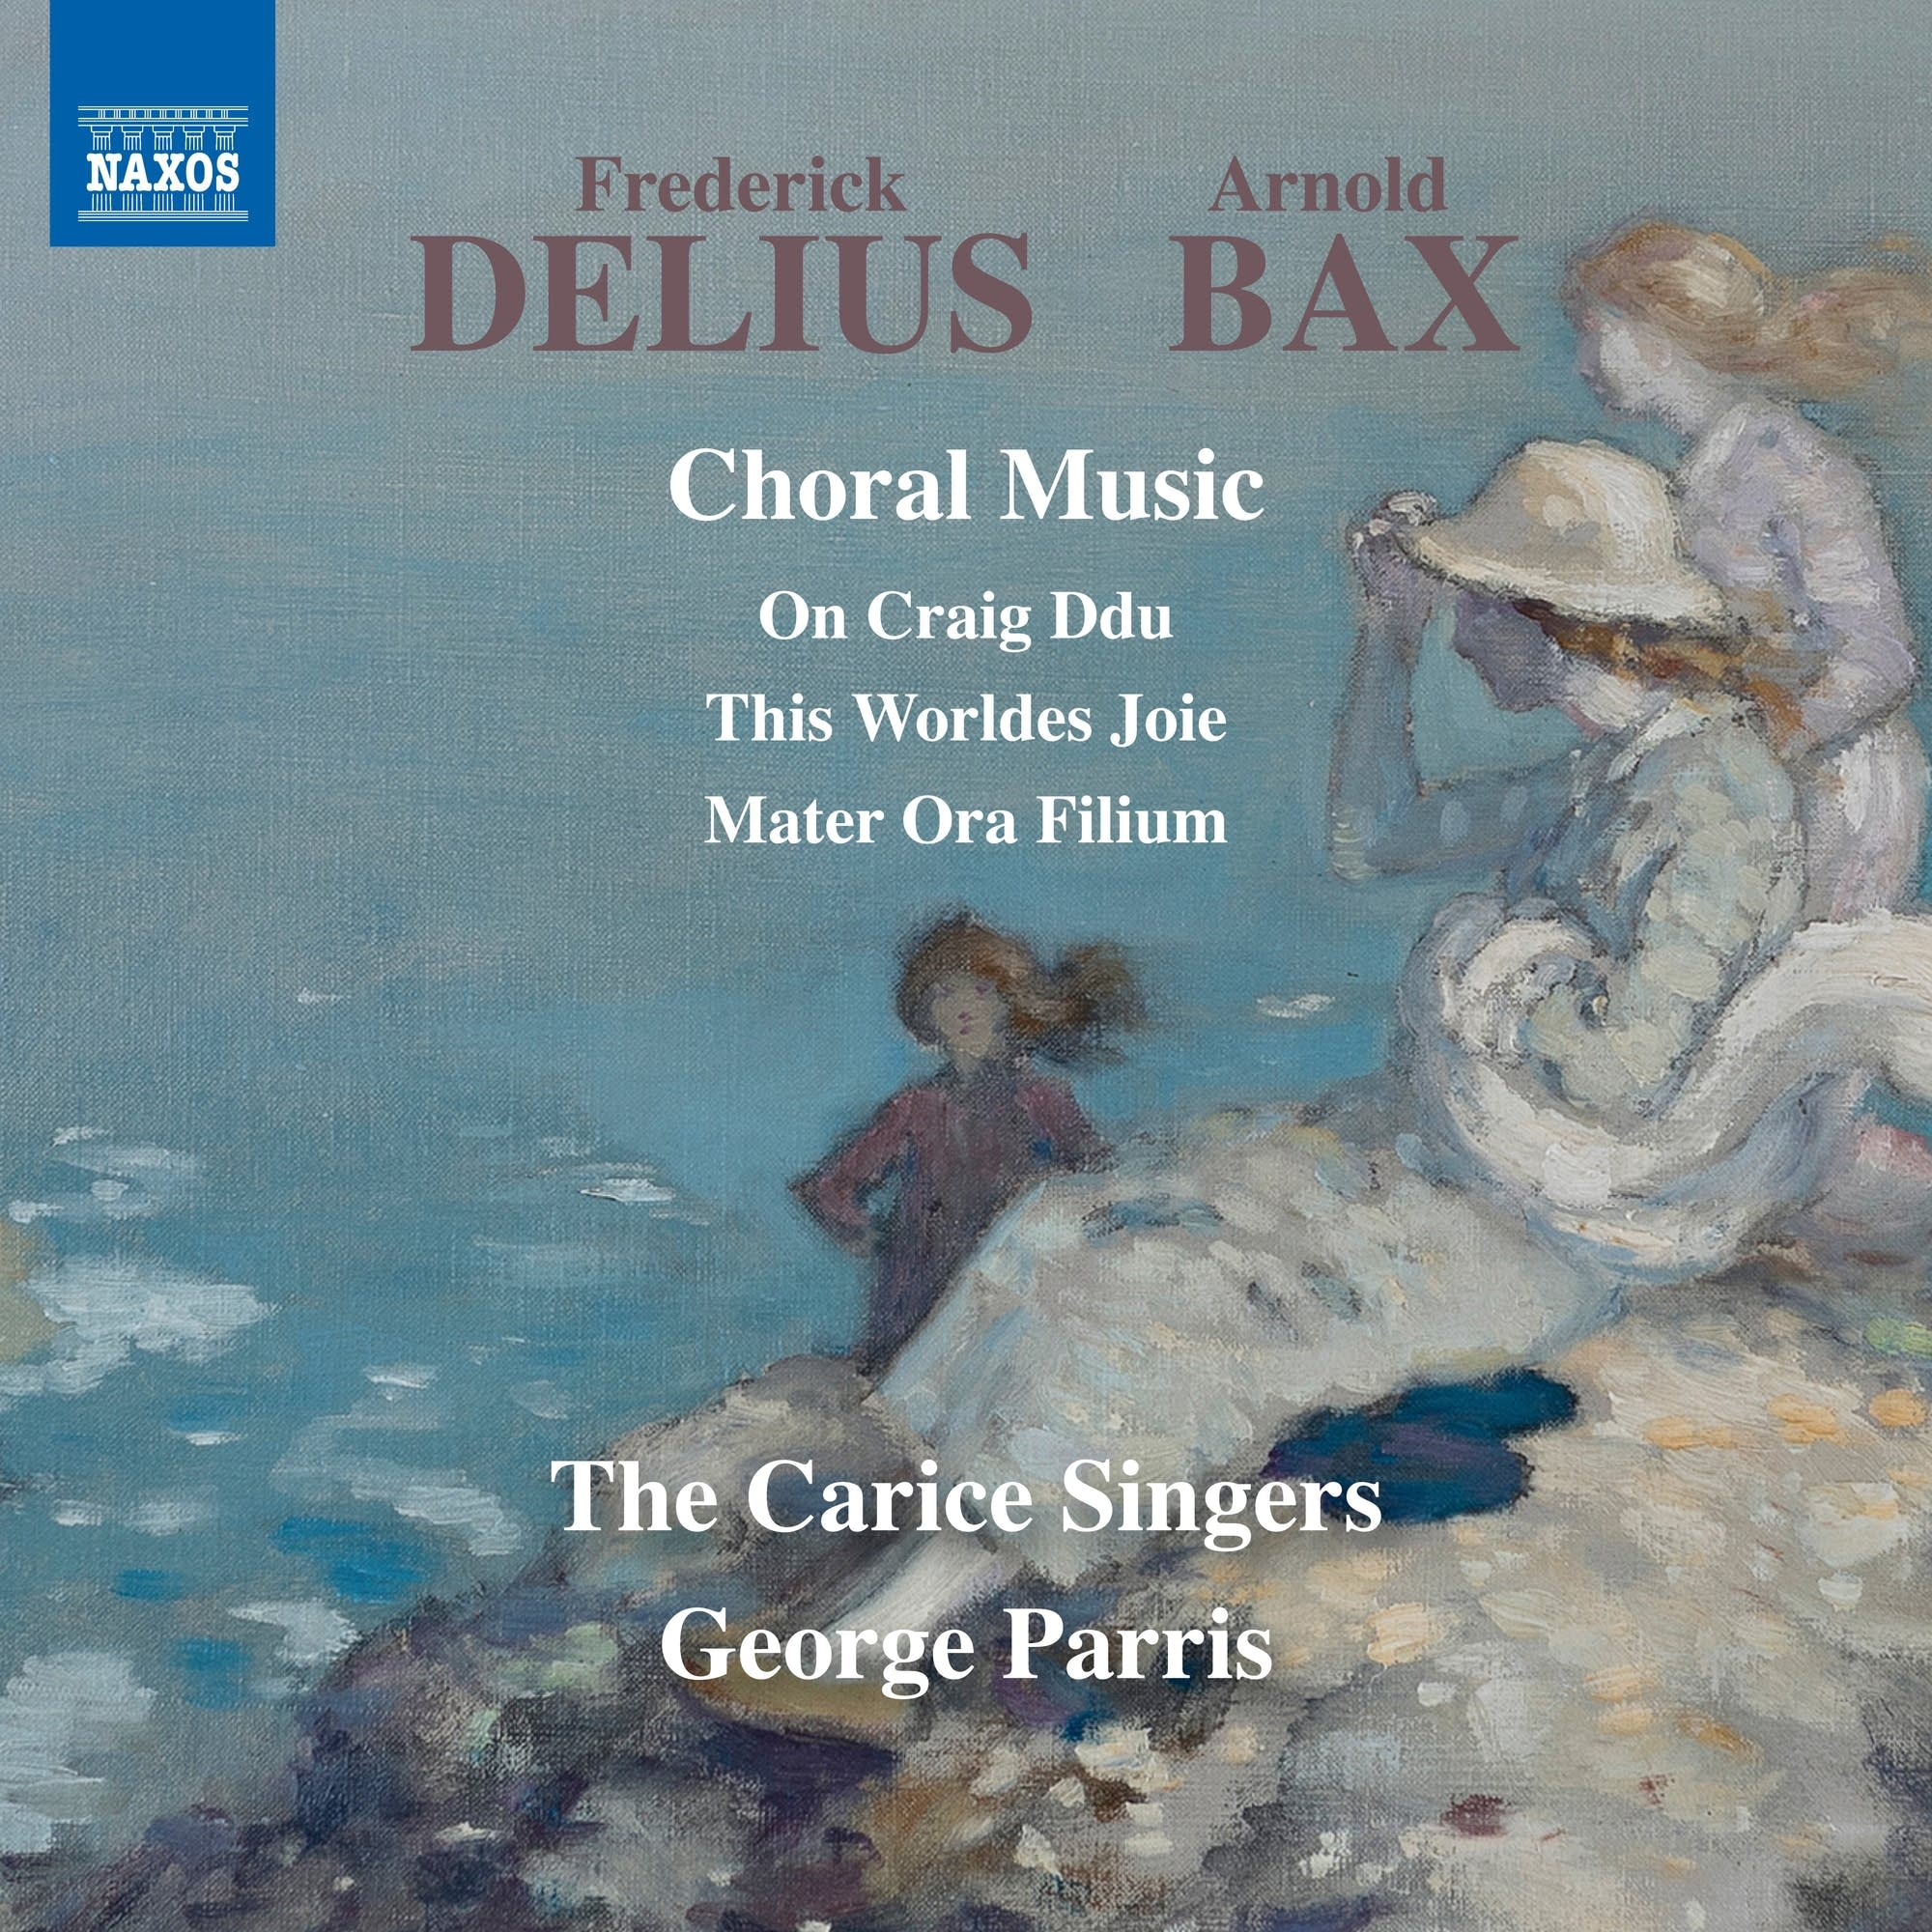 Frederick Delius Delius' Greatest Hits